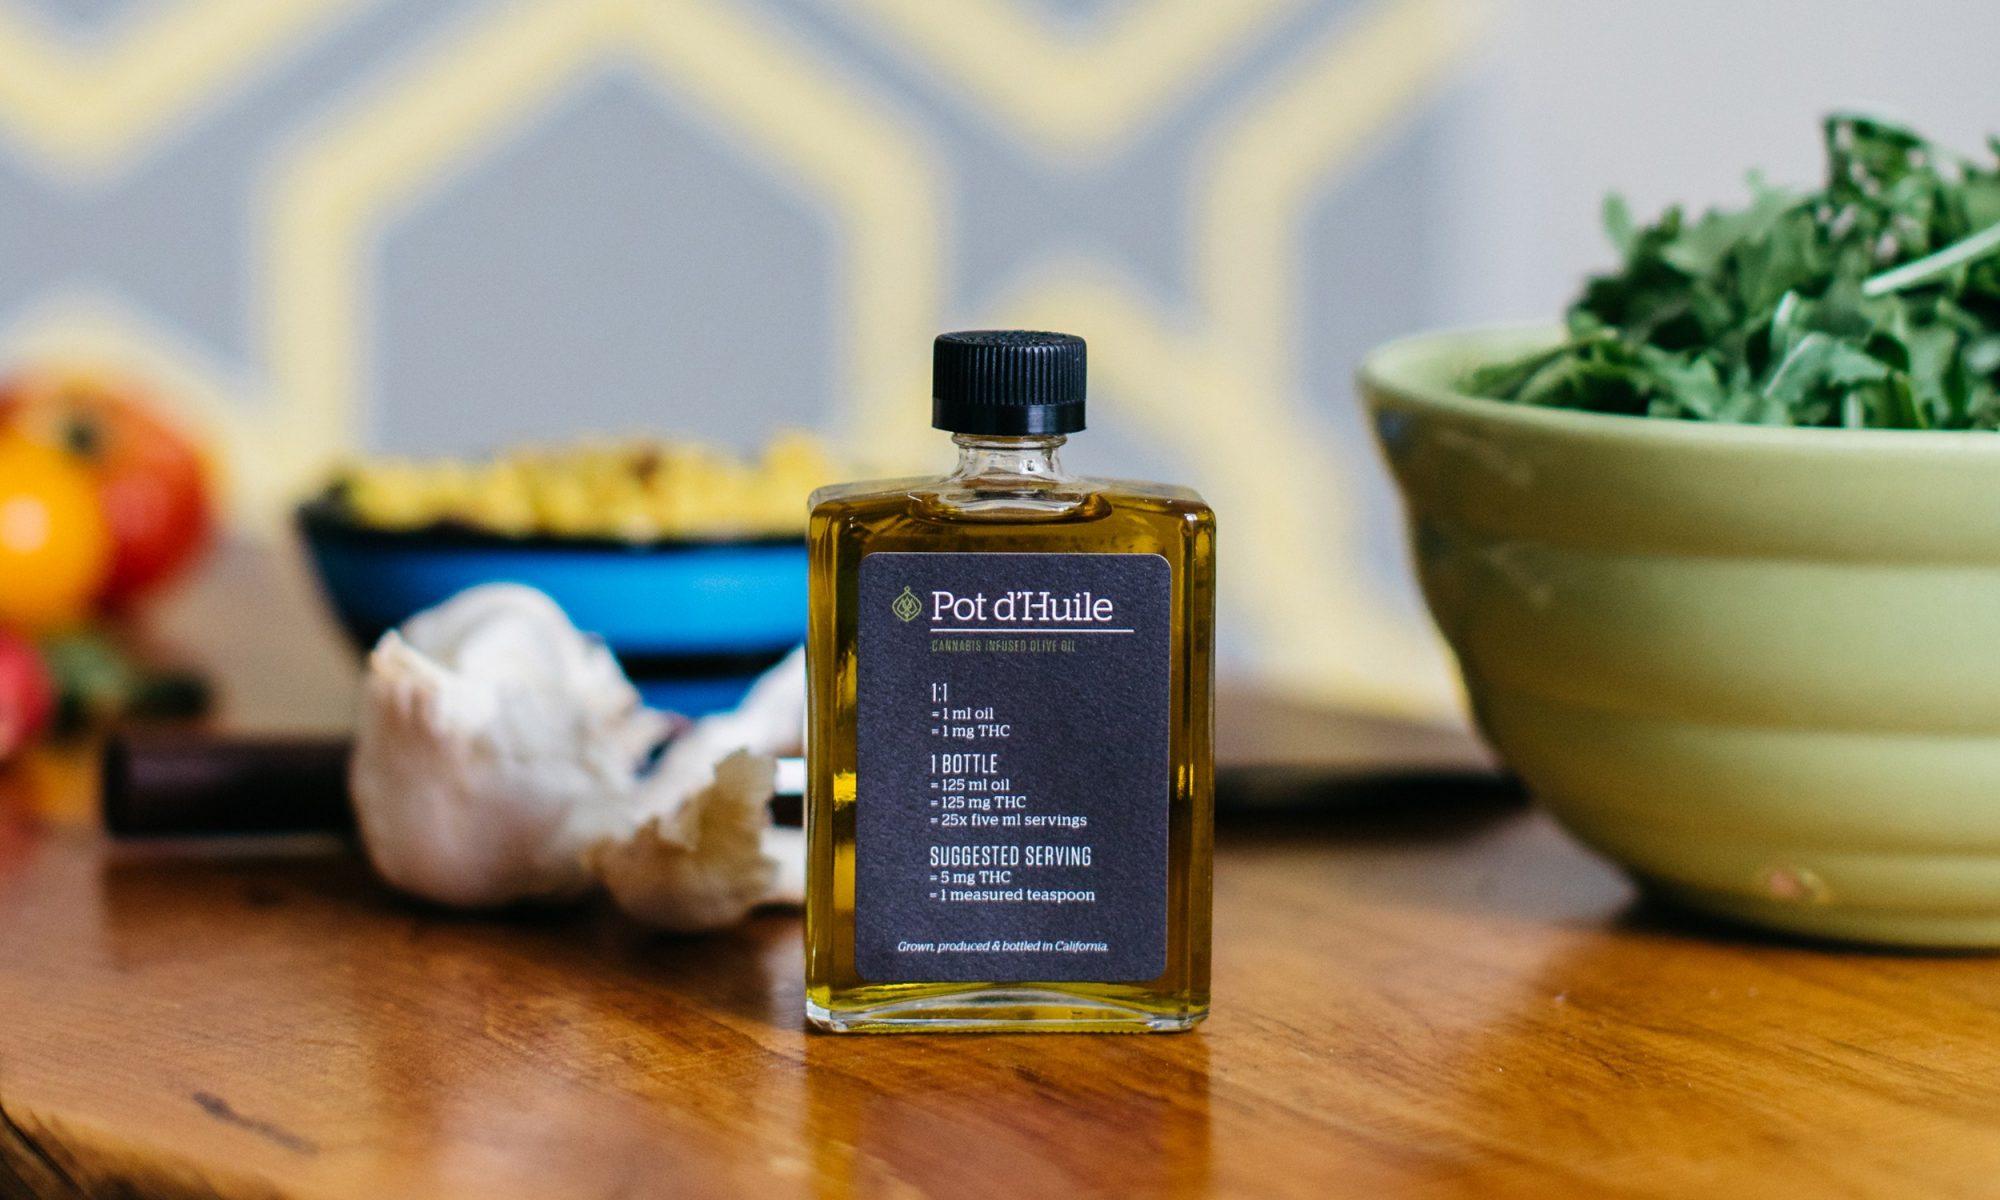 weed-infused pantry items